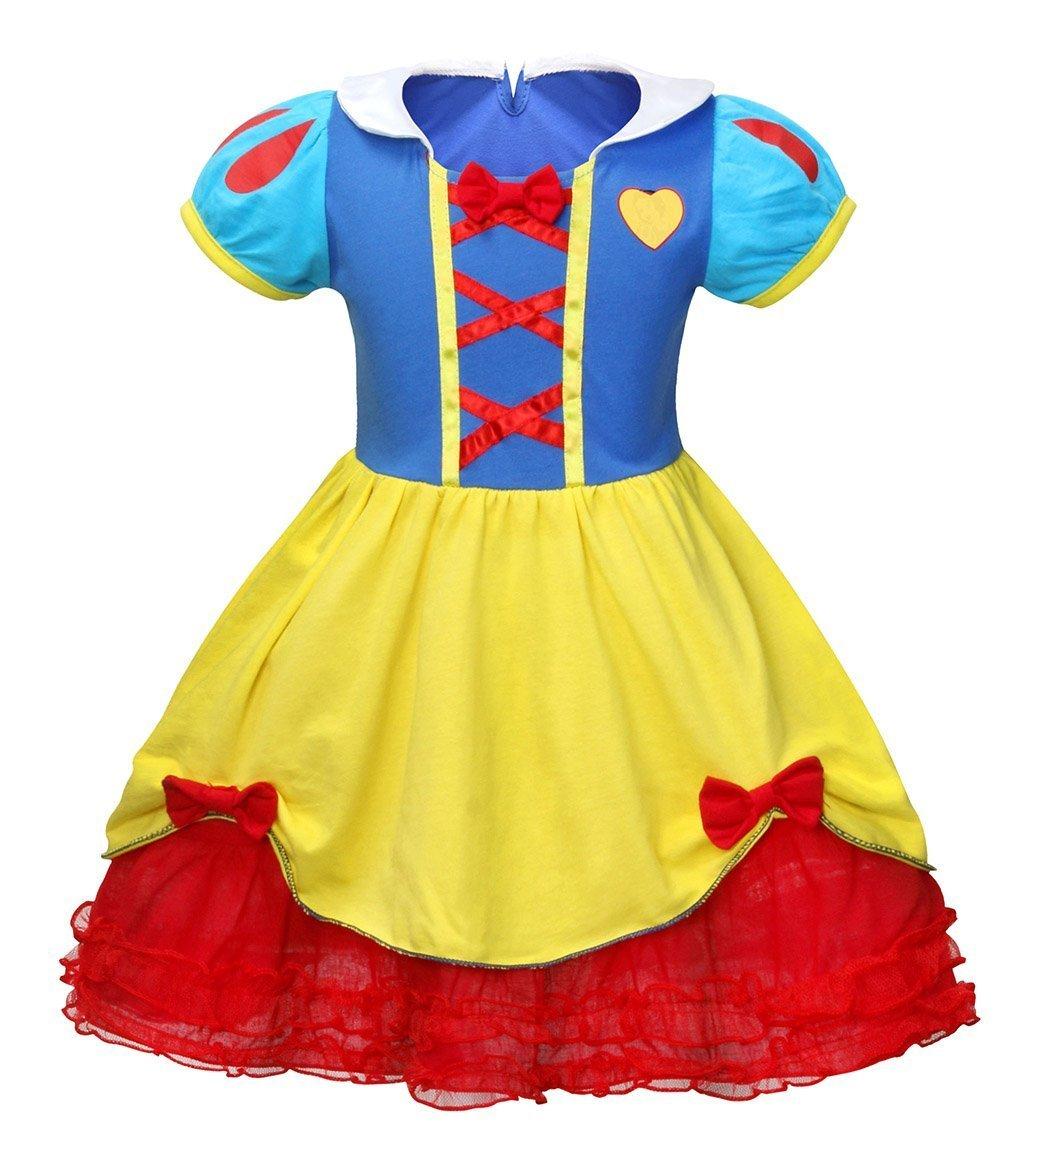 Jurebecia Baby Girls Snow White Dress Princess Dress Up Toddler Halloween Birthday Party Dress Size 2T